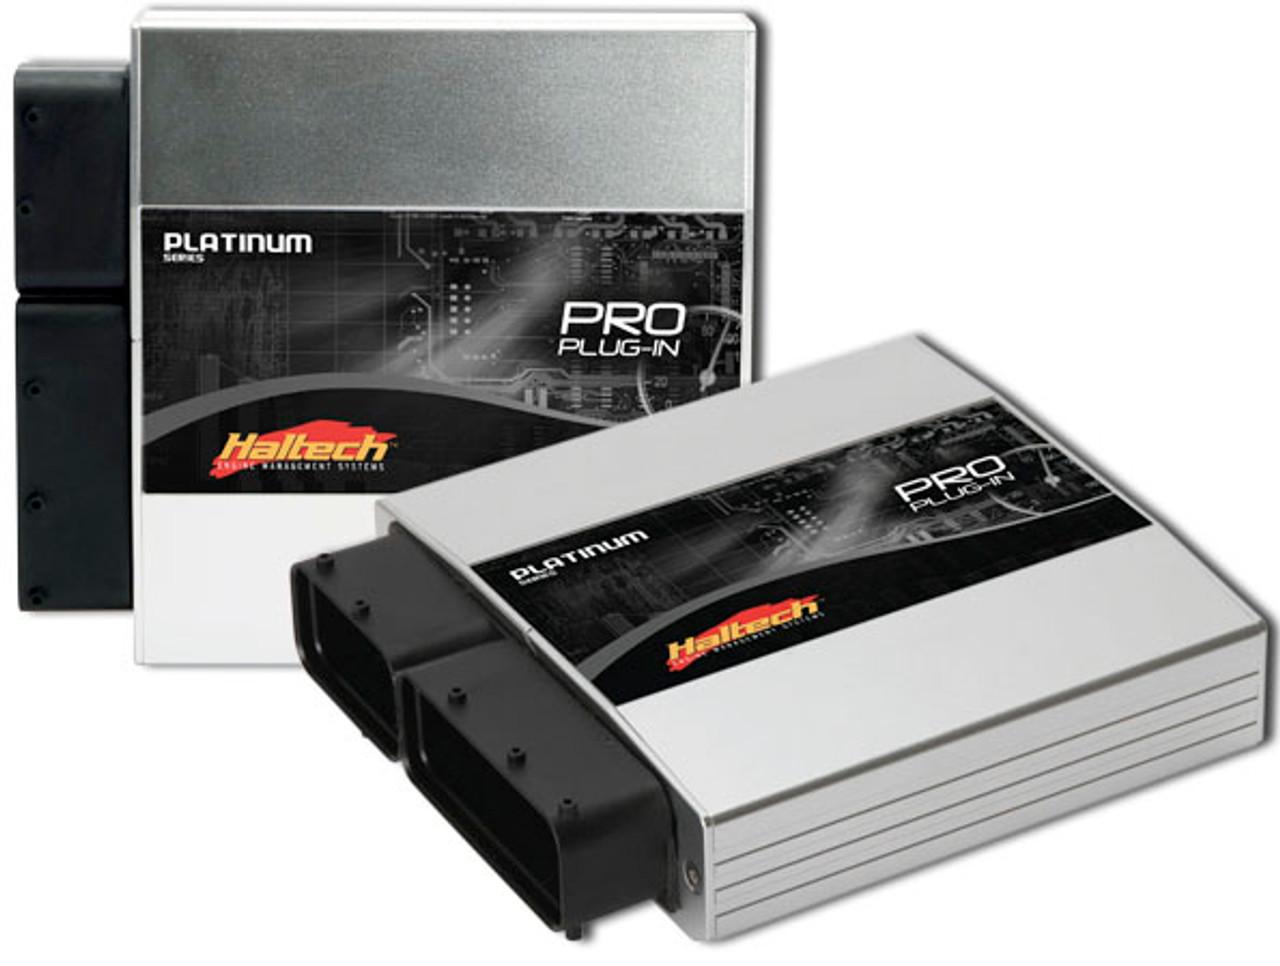 Haltech Platinum Plug-In Pro Standalone ECU - Hyundai Genesis 2 0T